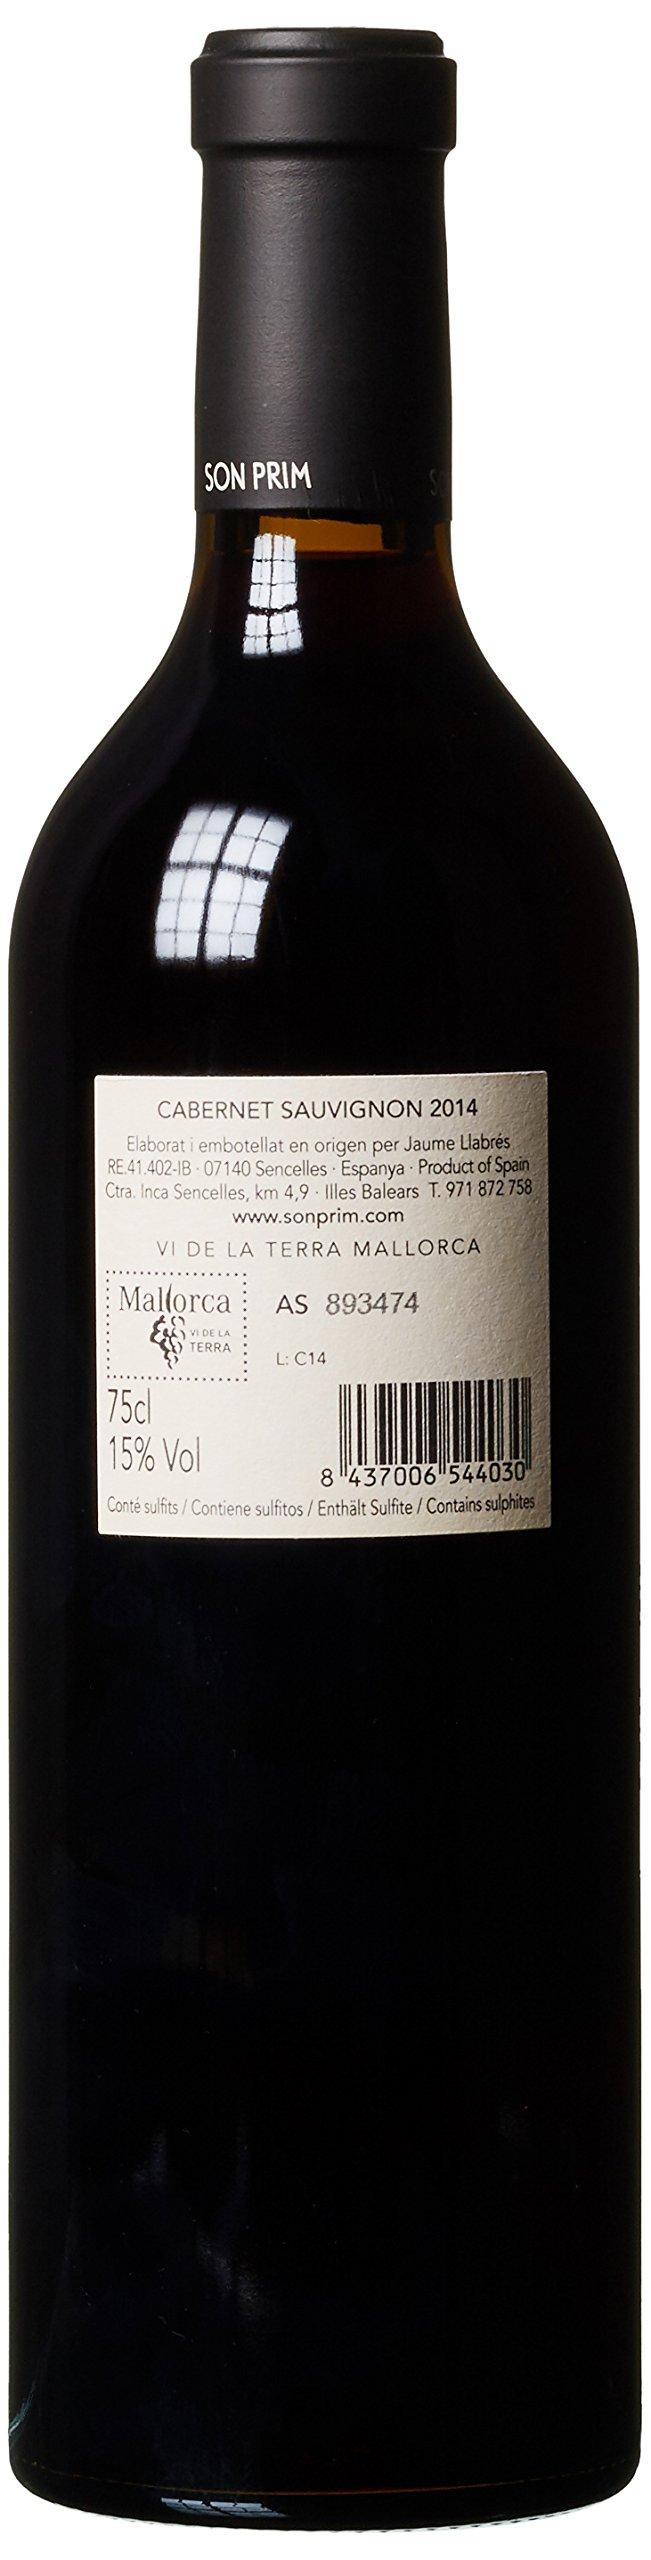 Son-Prim-Cabernet-Sauvignon-2015-trocken-3-x-075-l